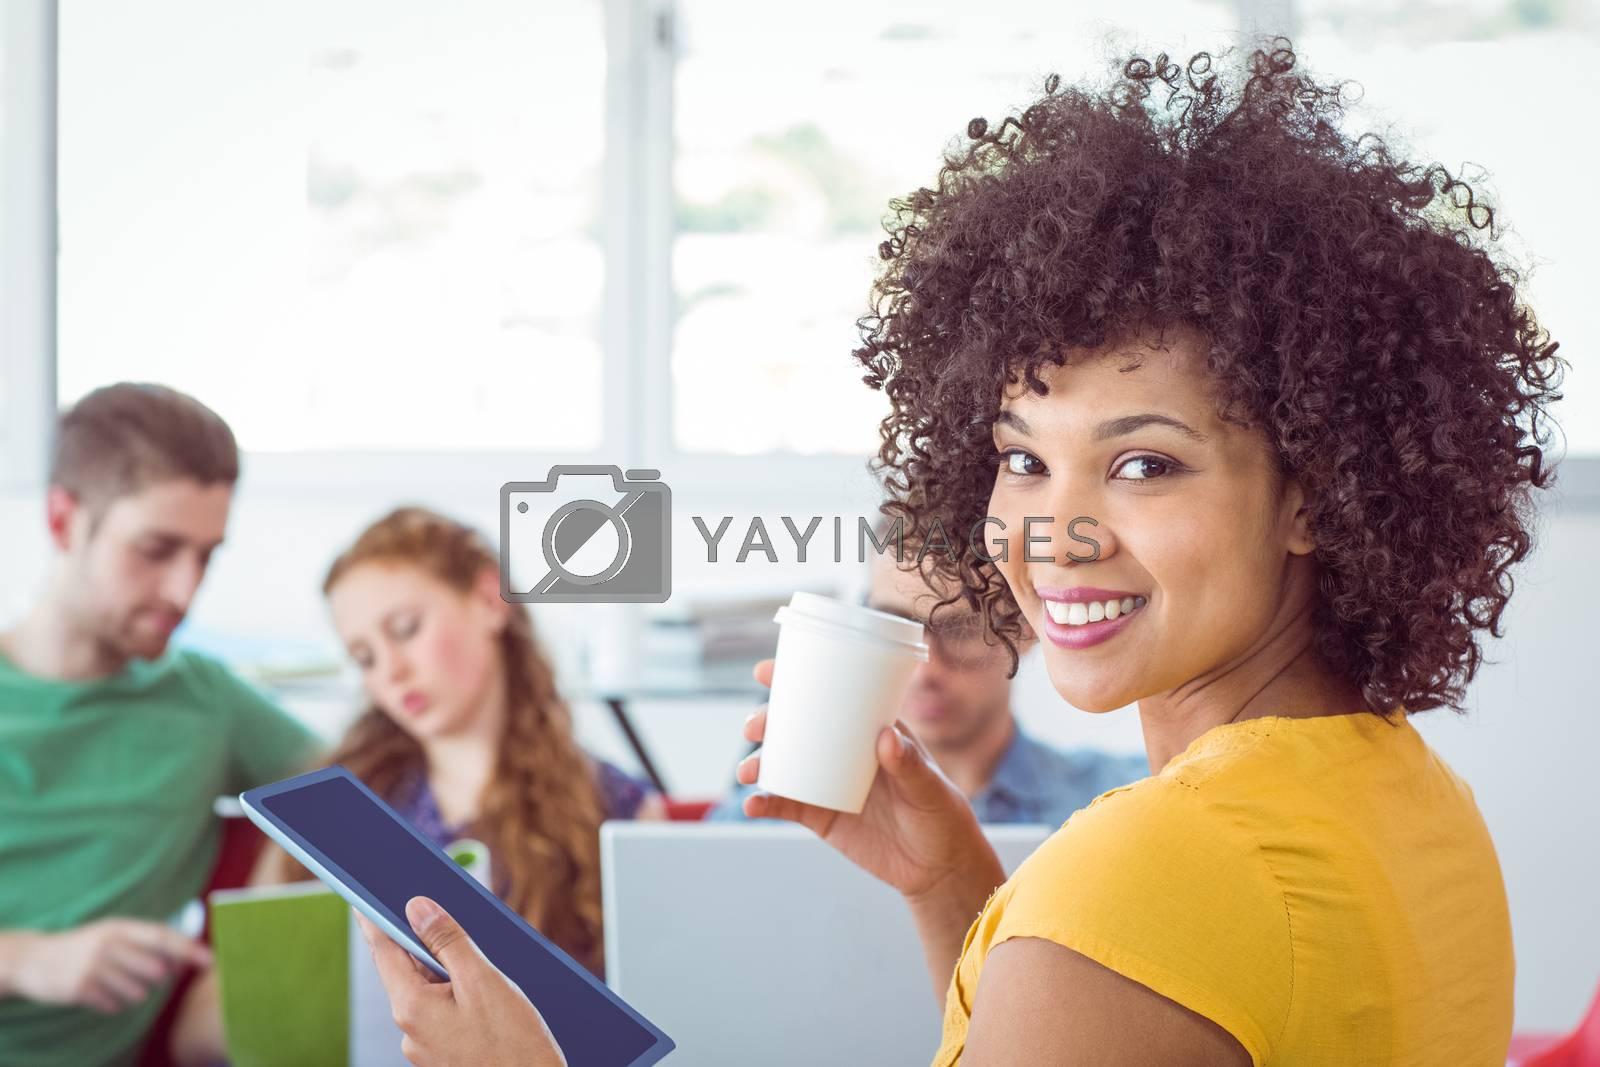 Fashion student smiling at camera by Wavebreakmedia